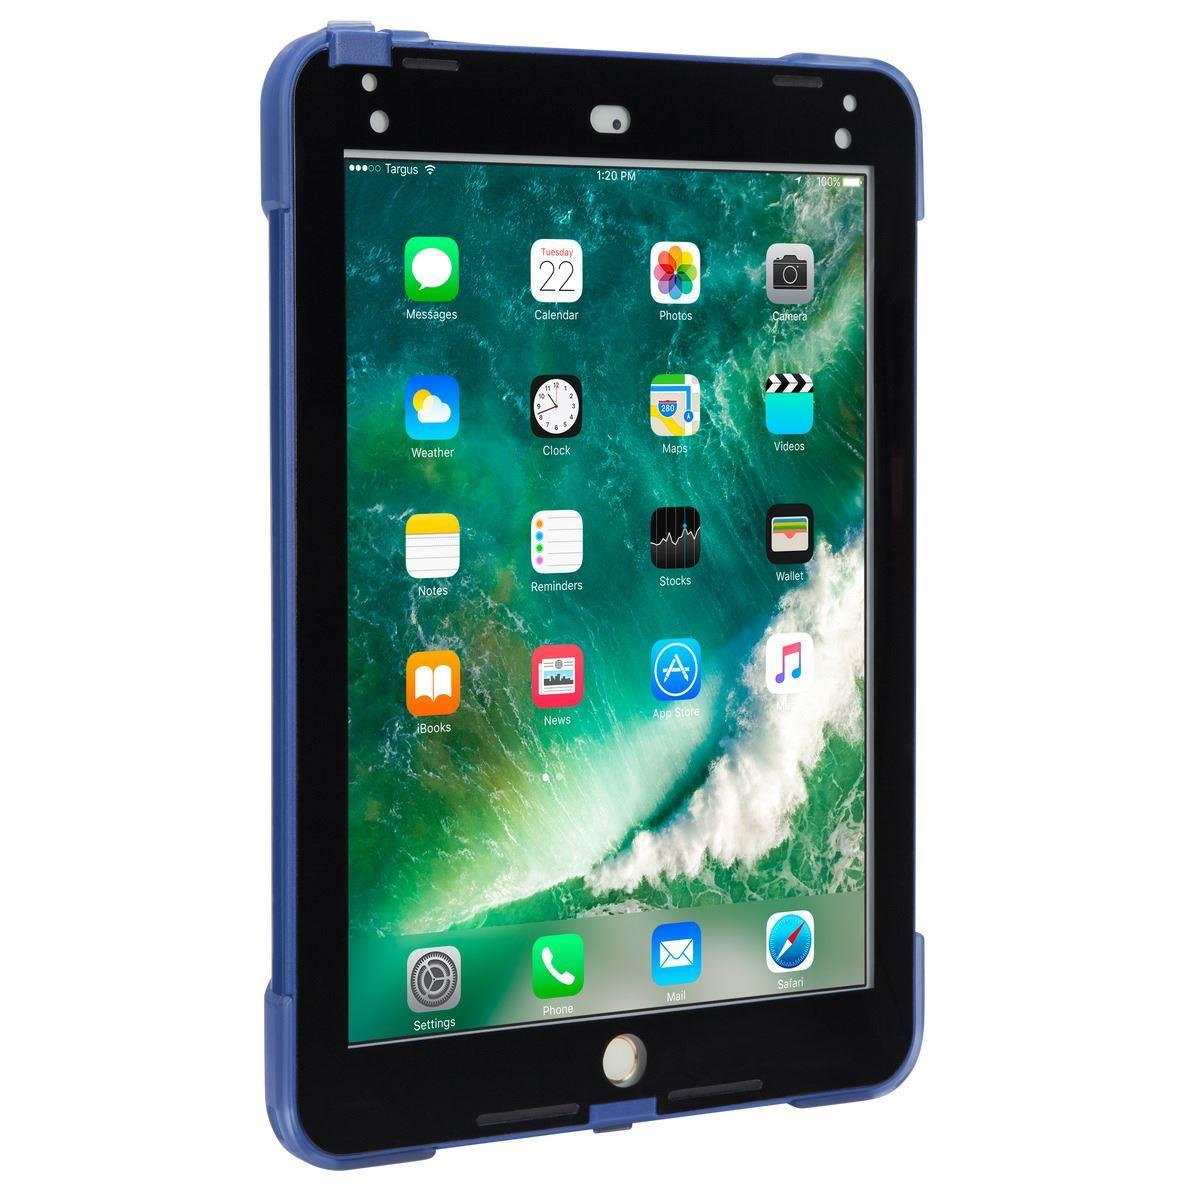 Targus SafePort Rugged Tablet Case (Blue) for Apple iPad (2018/2017)/iPad Pro (9.7 inch)/iPad Air 2 (9.7 inch)